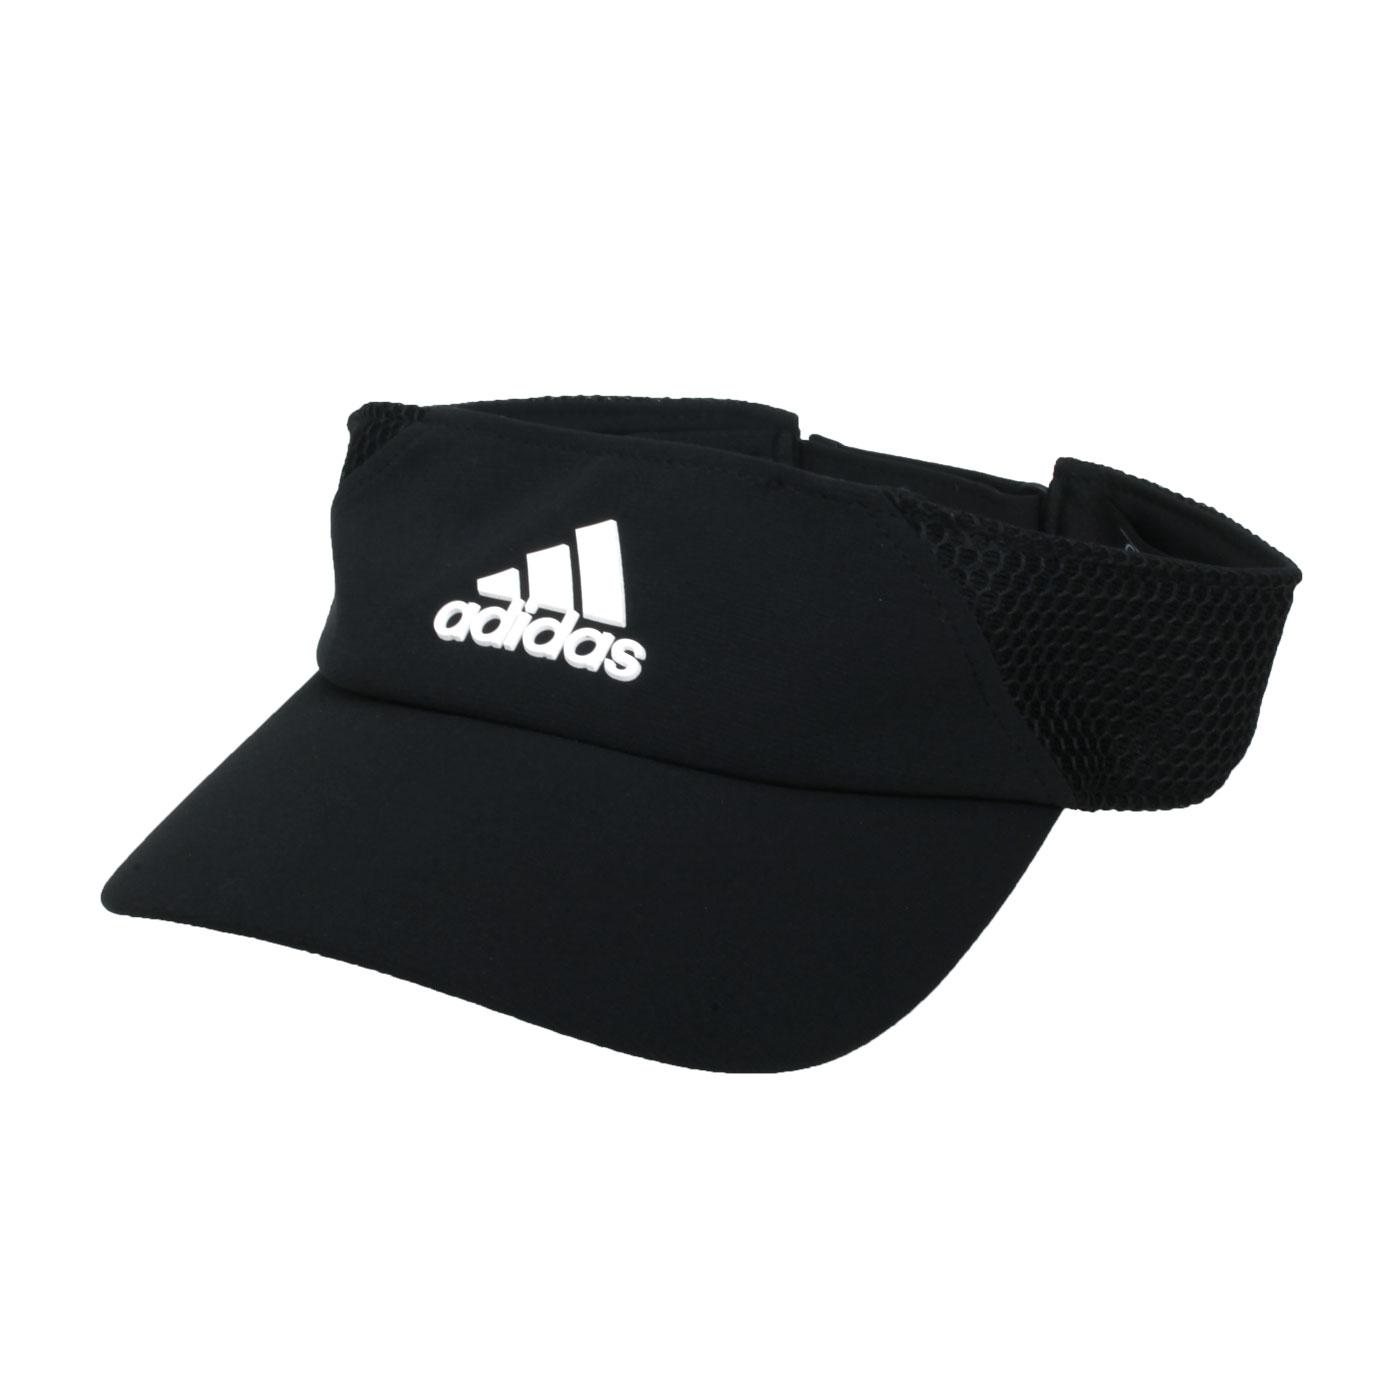 ADIDAS 帽子 GM6299 - 黑白